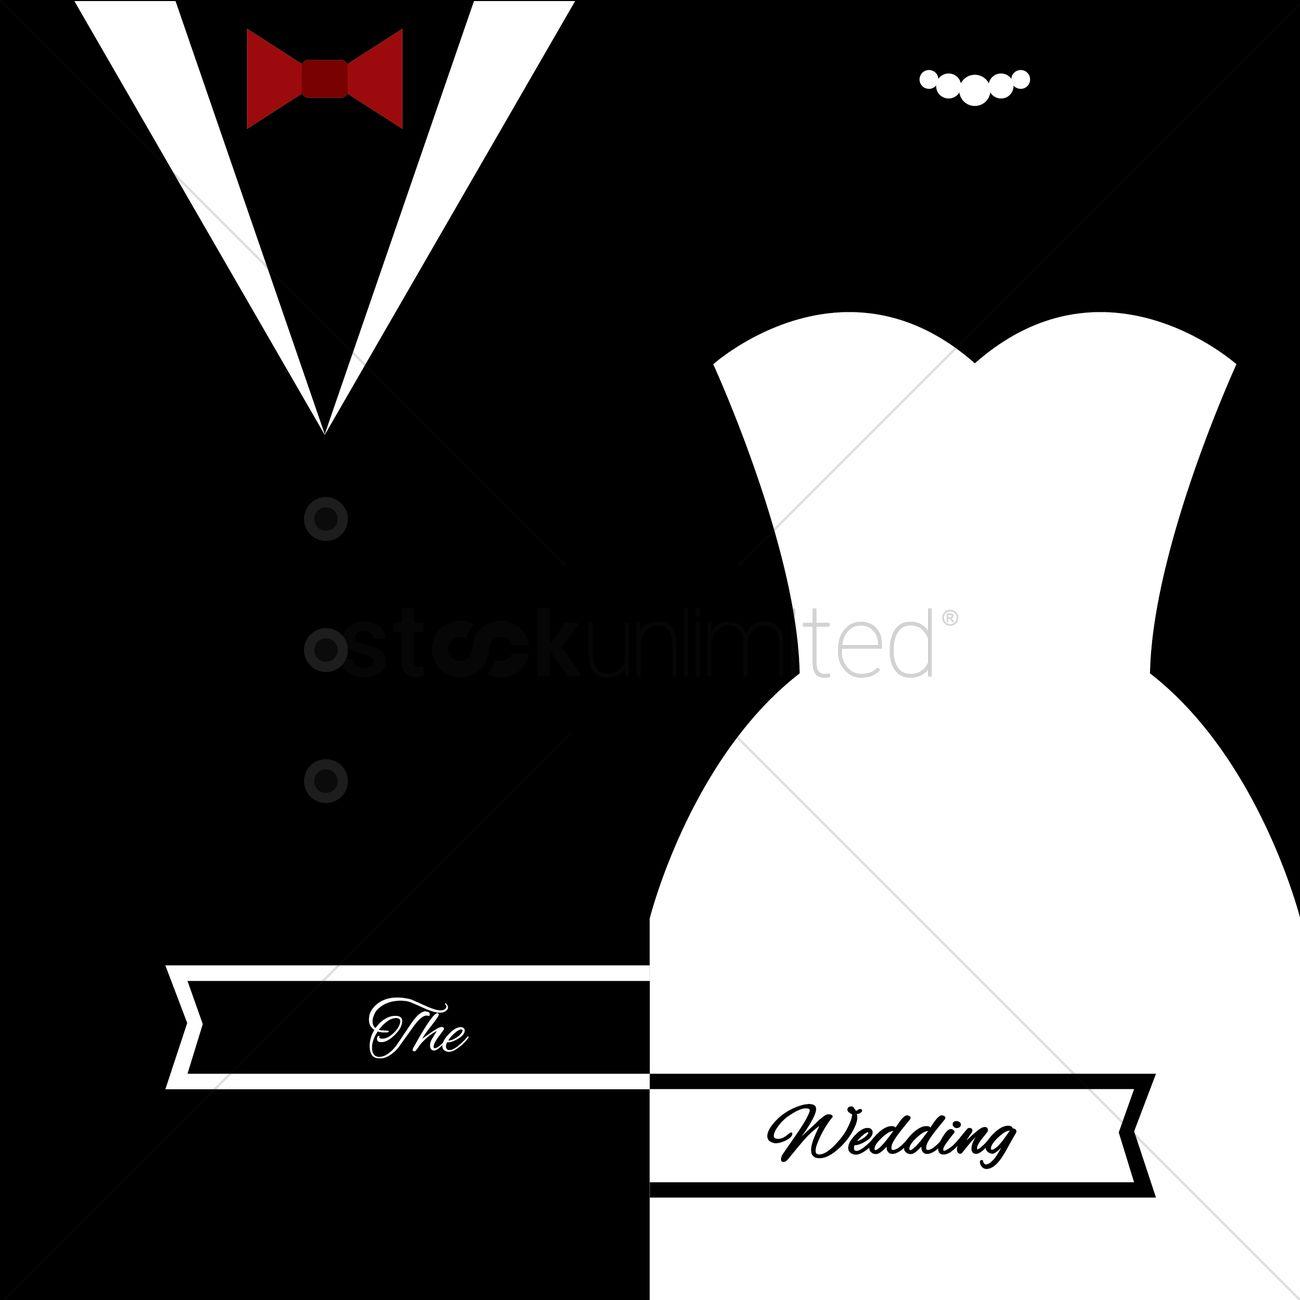 Wedding invitation vector image 1798128 stockunlimited wedding invitation vector graphic stopboris Gallery